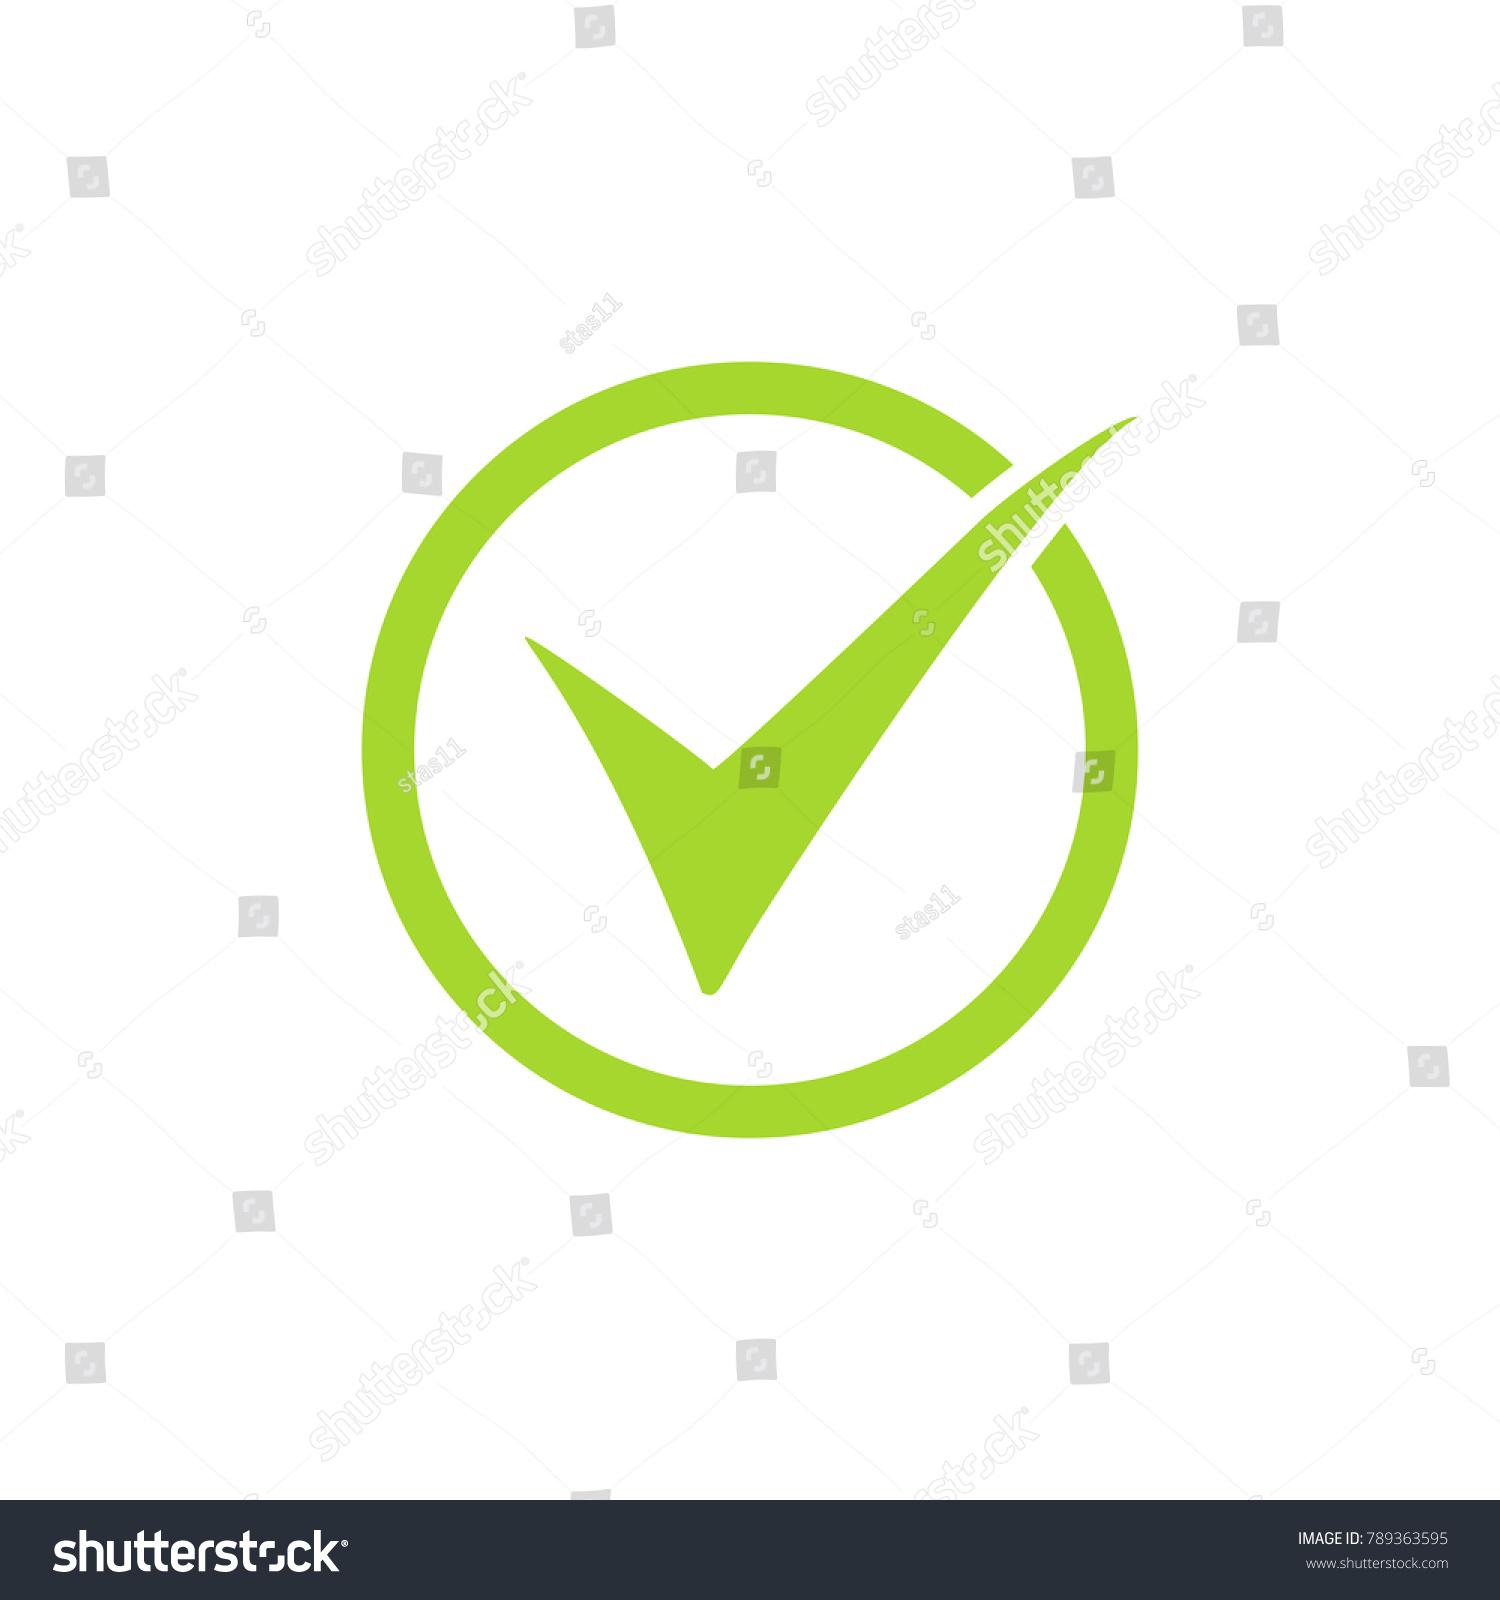 Checkmark symbol in word choice image symbol and sign ideas symbol check mark choice image symbol and sign ideas correct tick symbol gallery symbol design logo buycottarizona